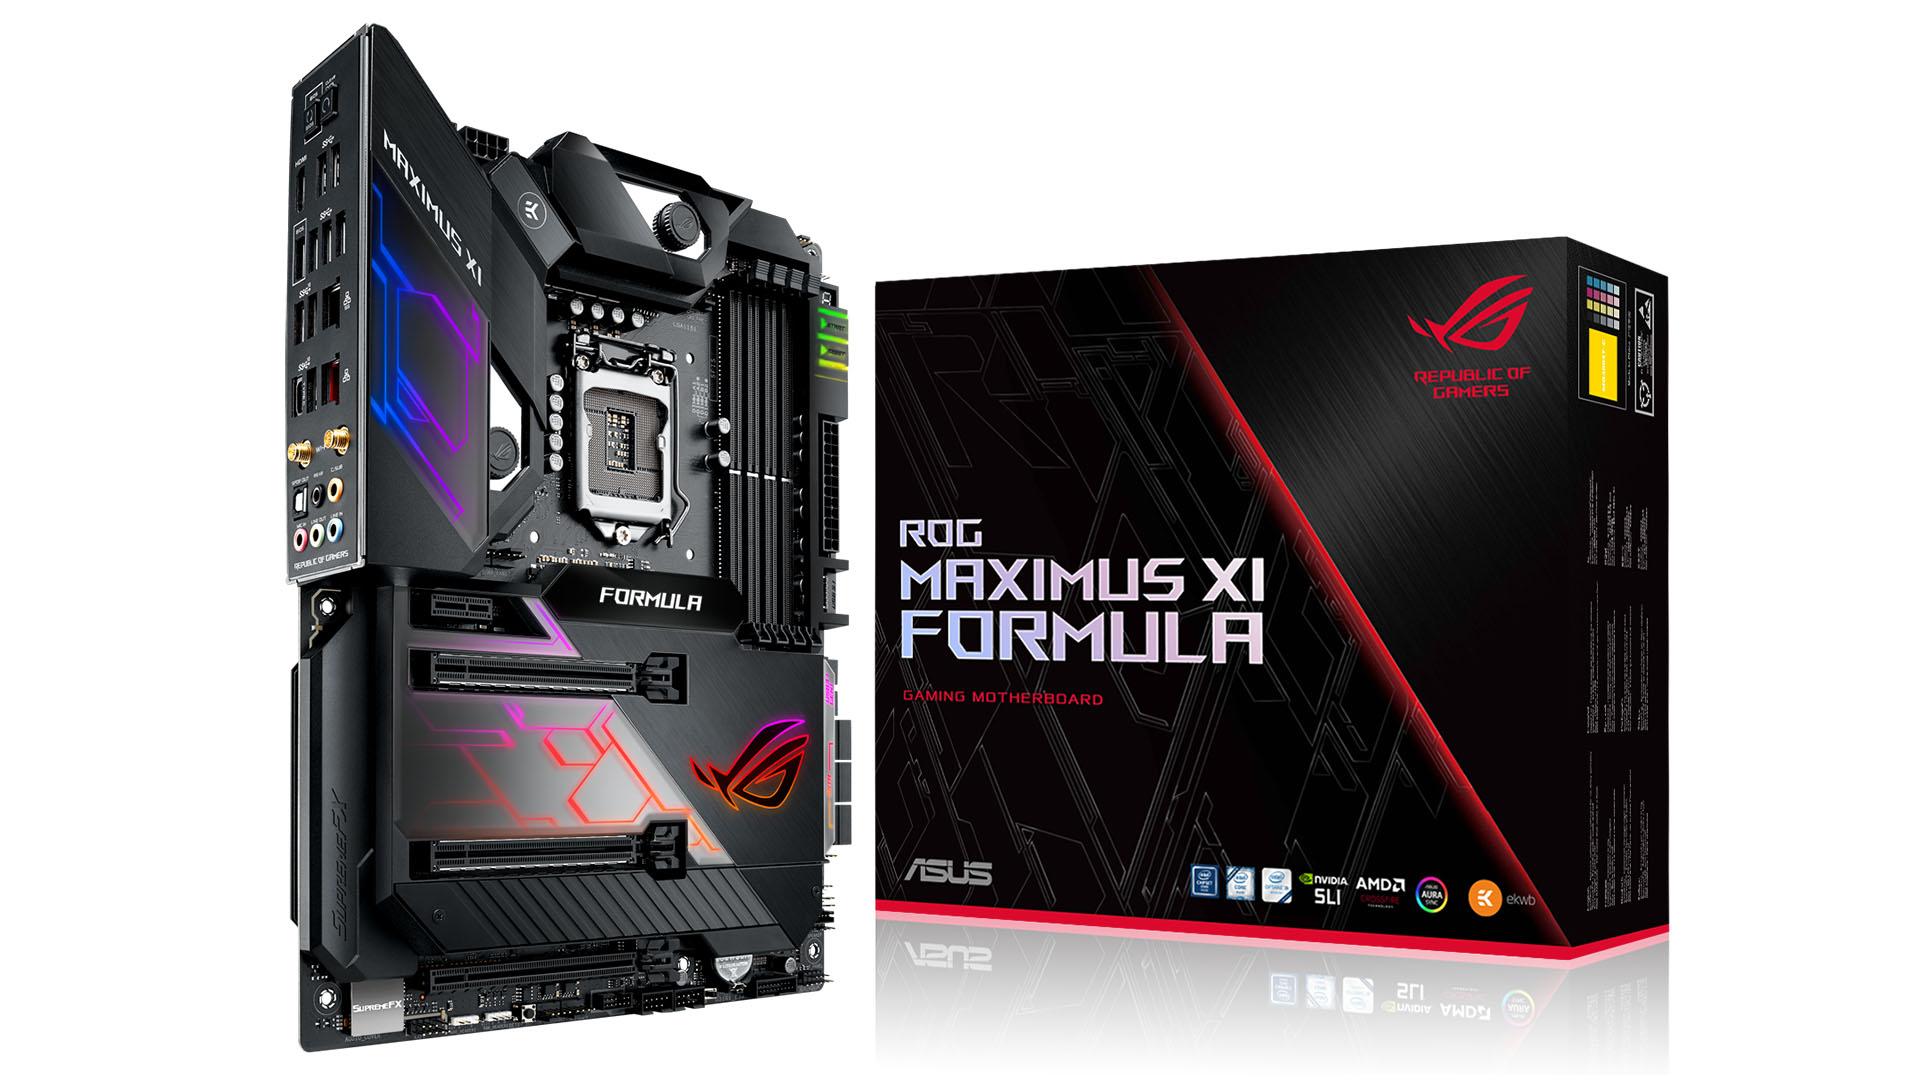 Resultado de imagen para ROG Maximus XI Formula png